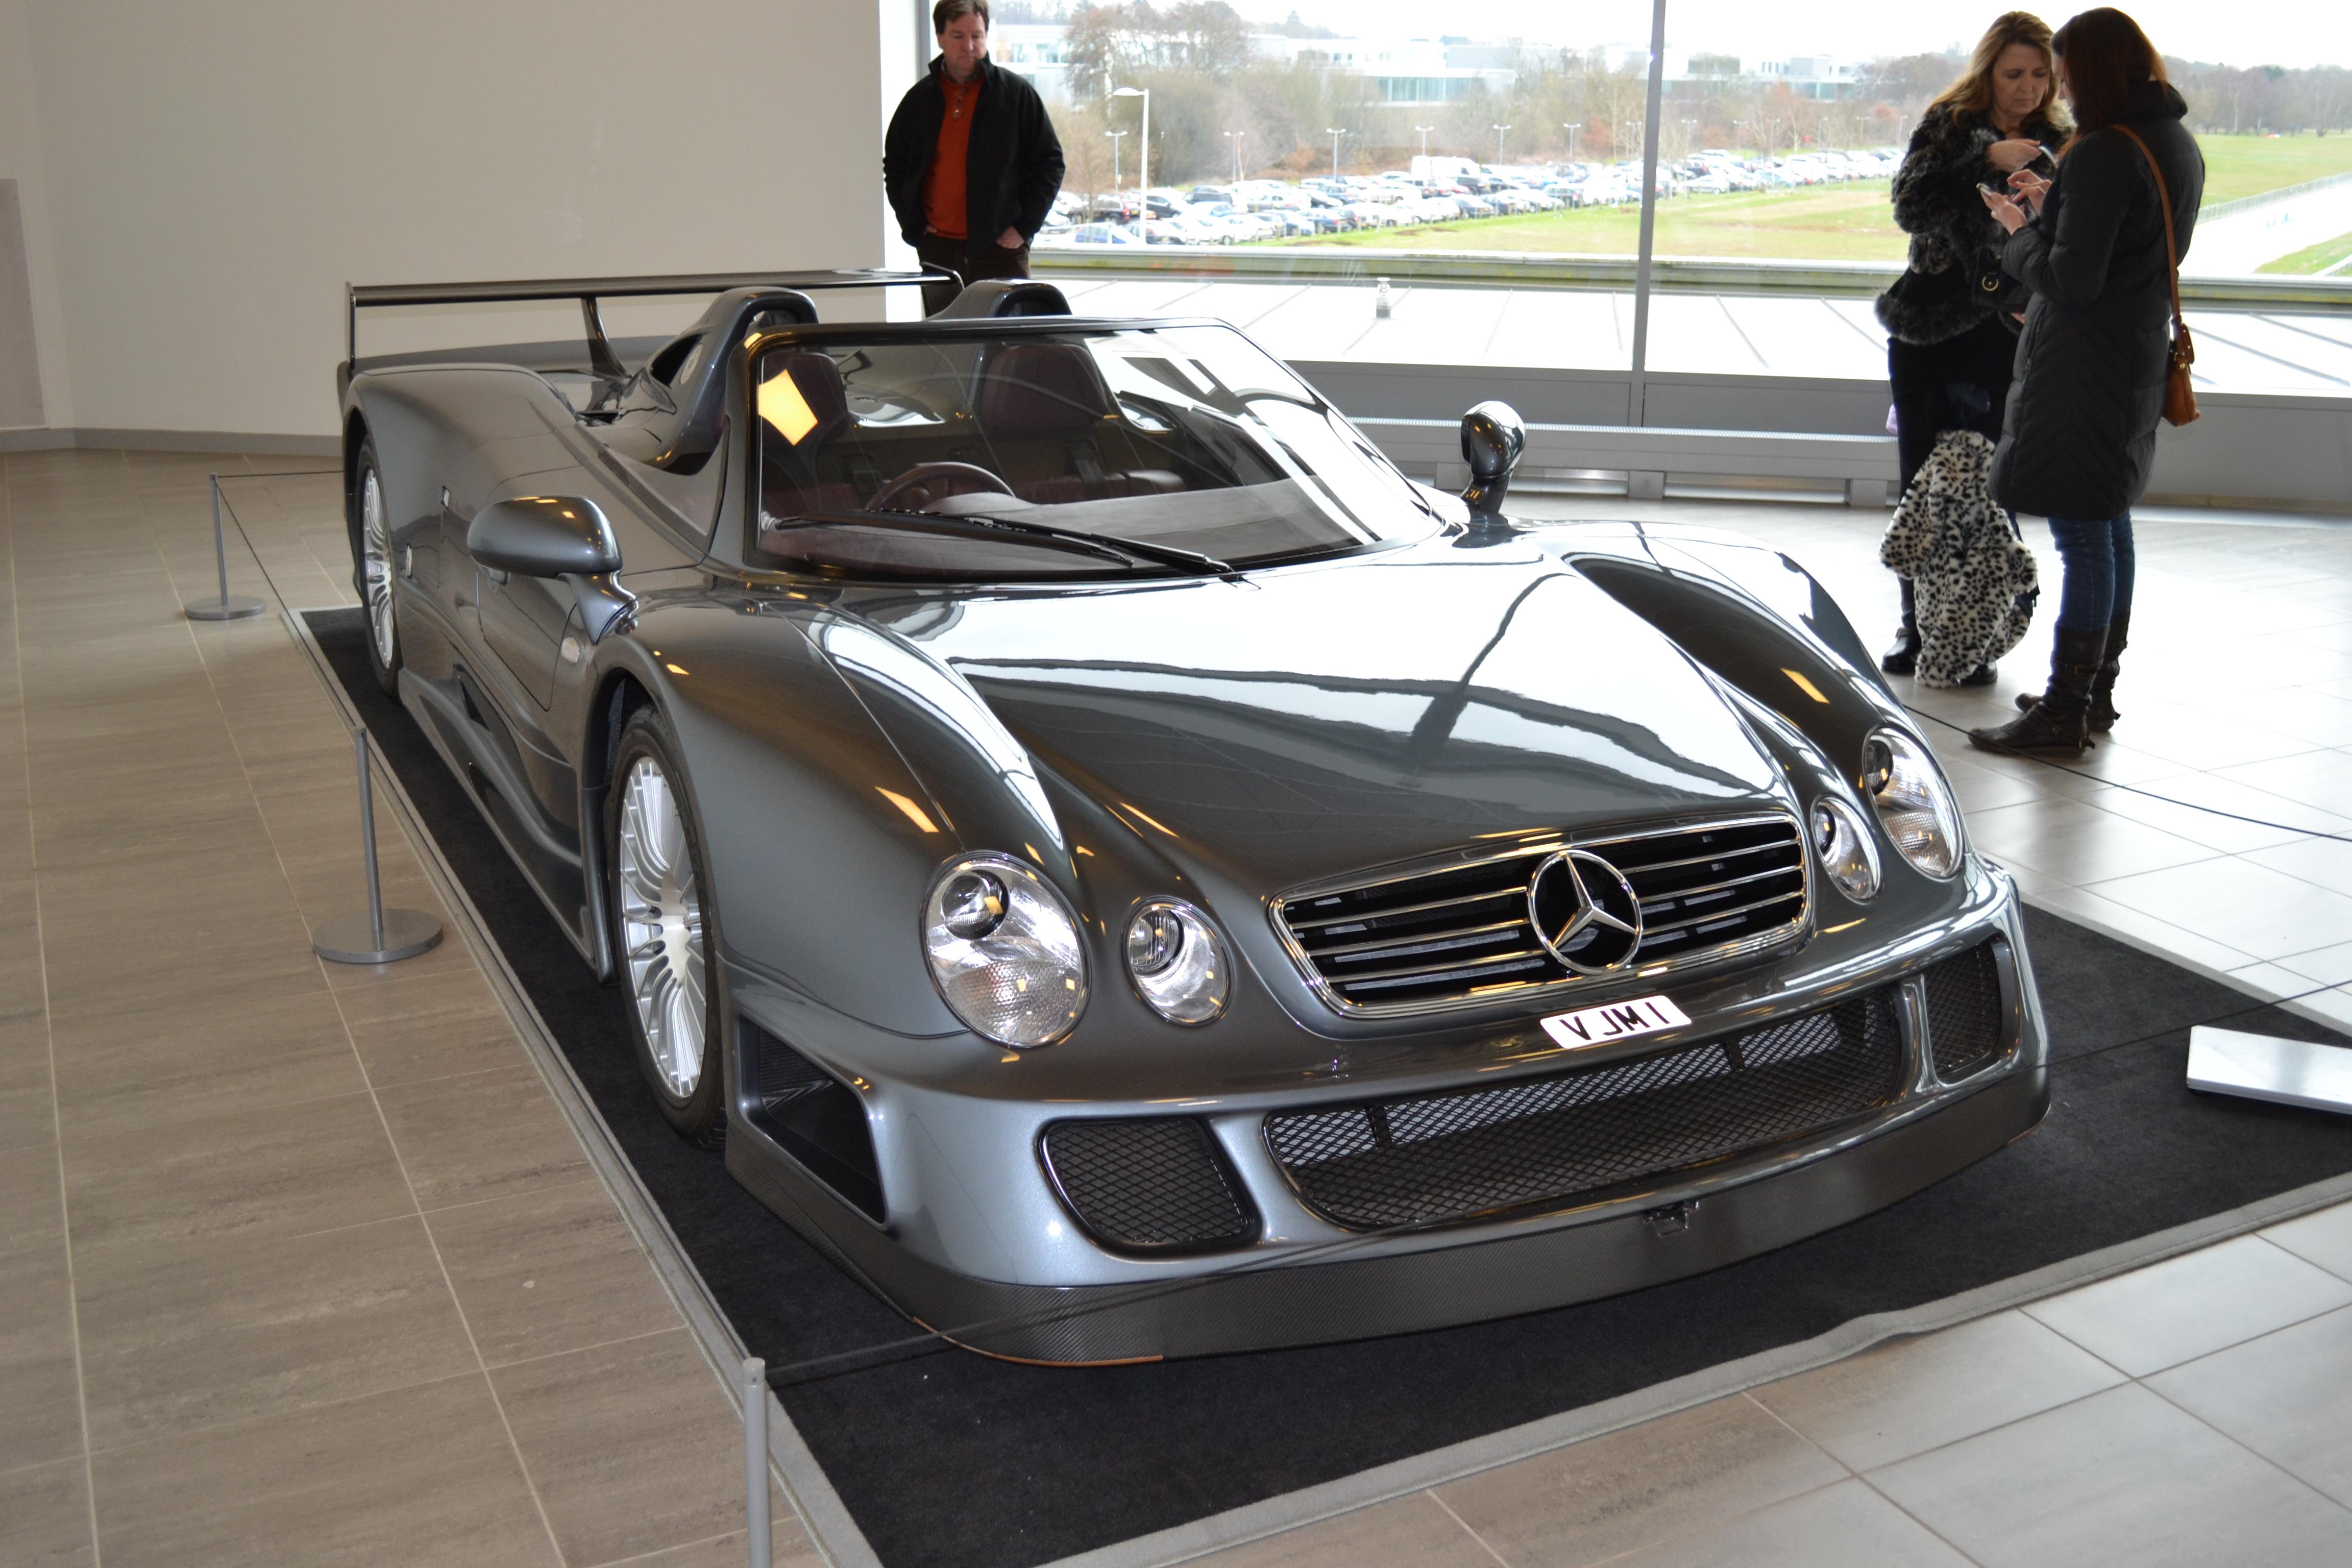 The Mystique Behind The Mercedes Clk Gtr